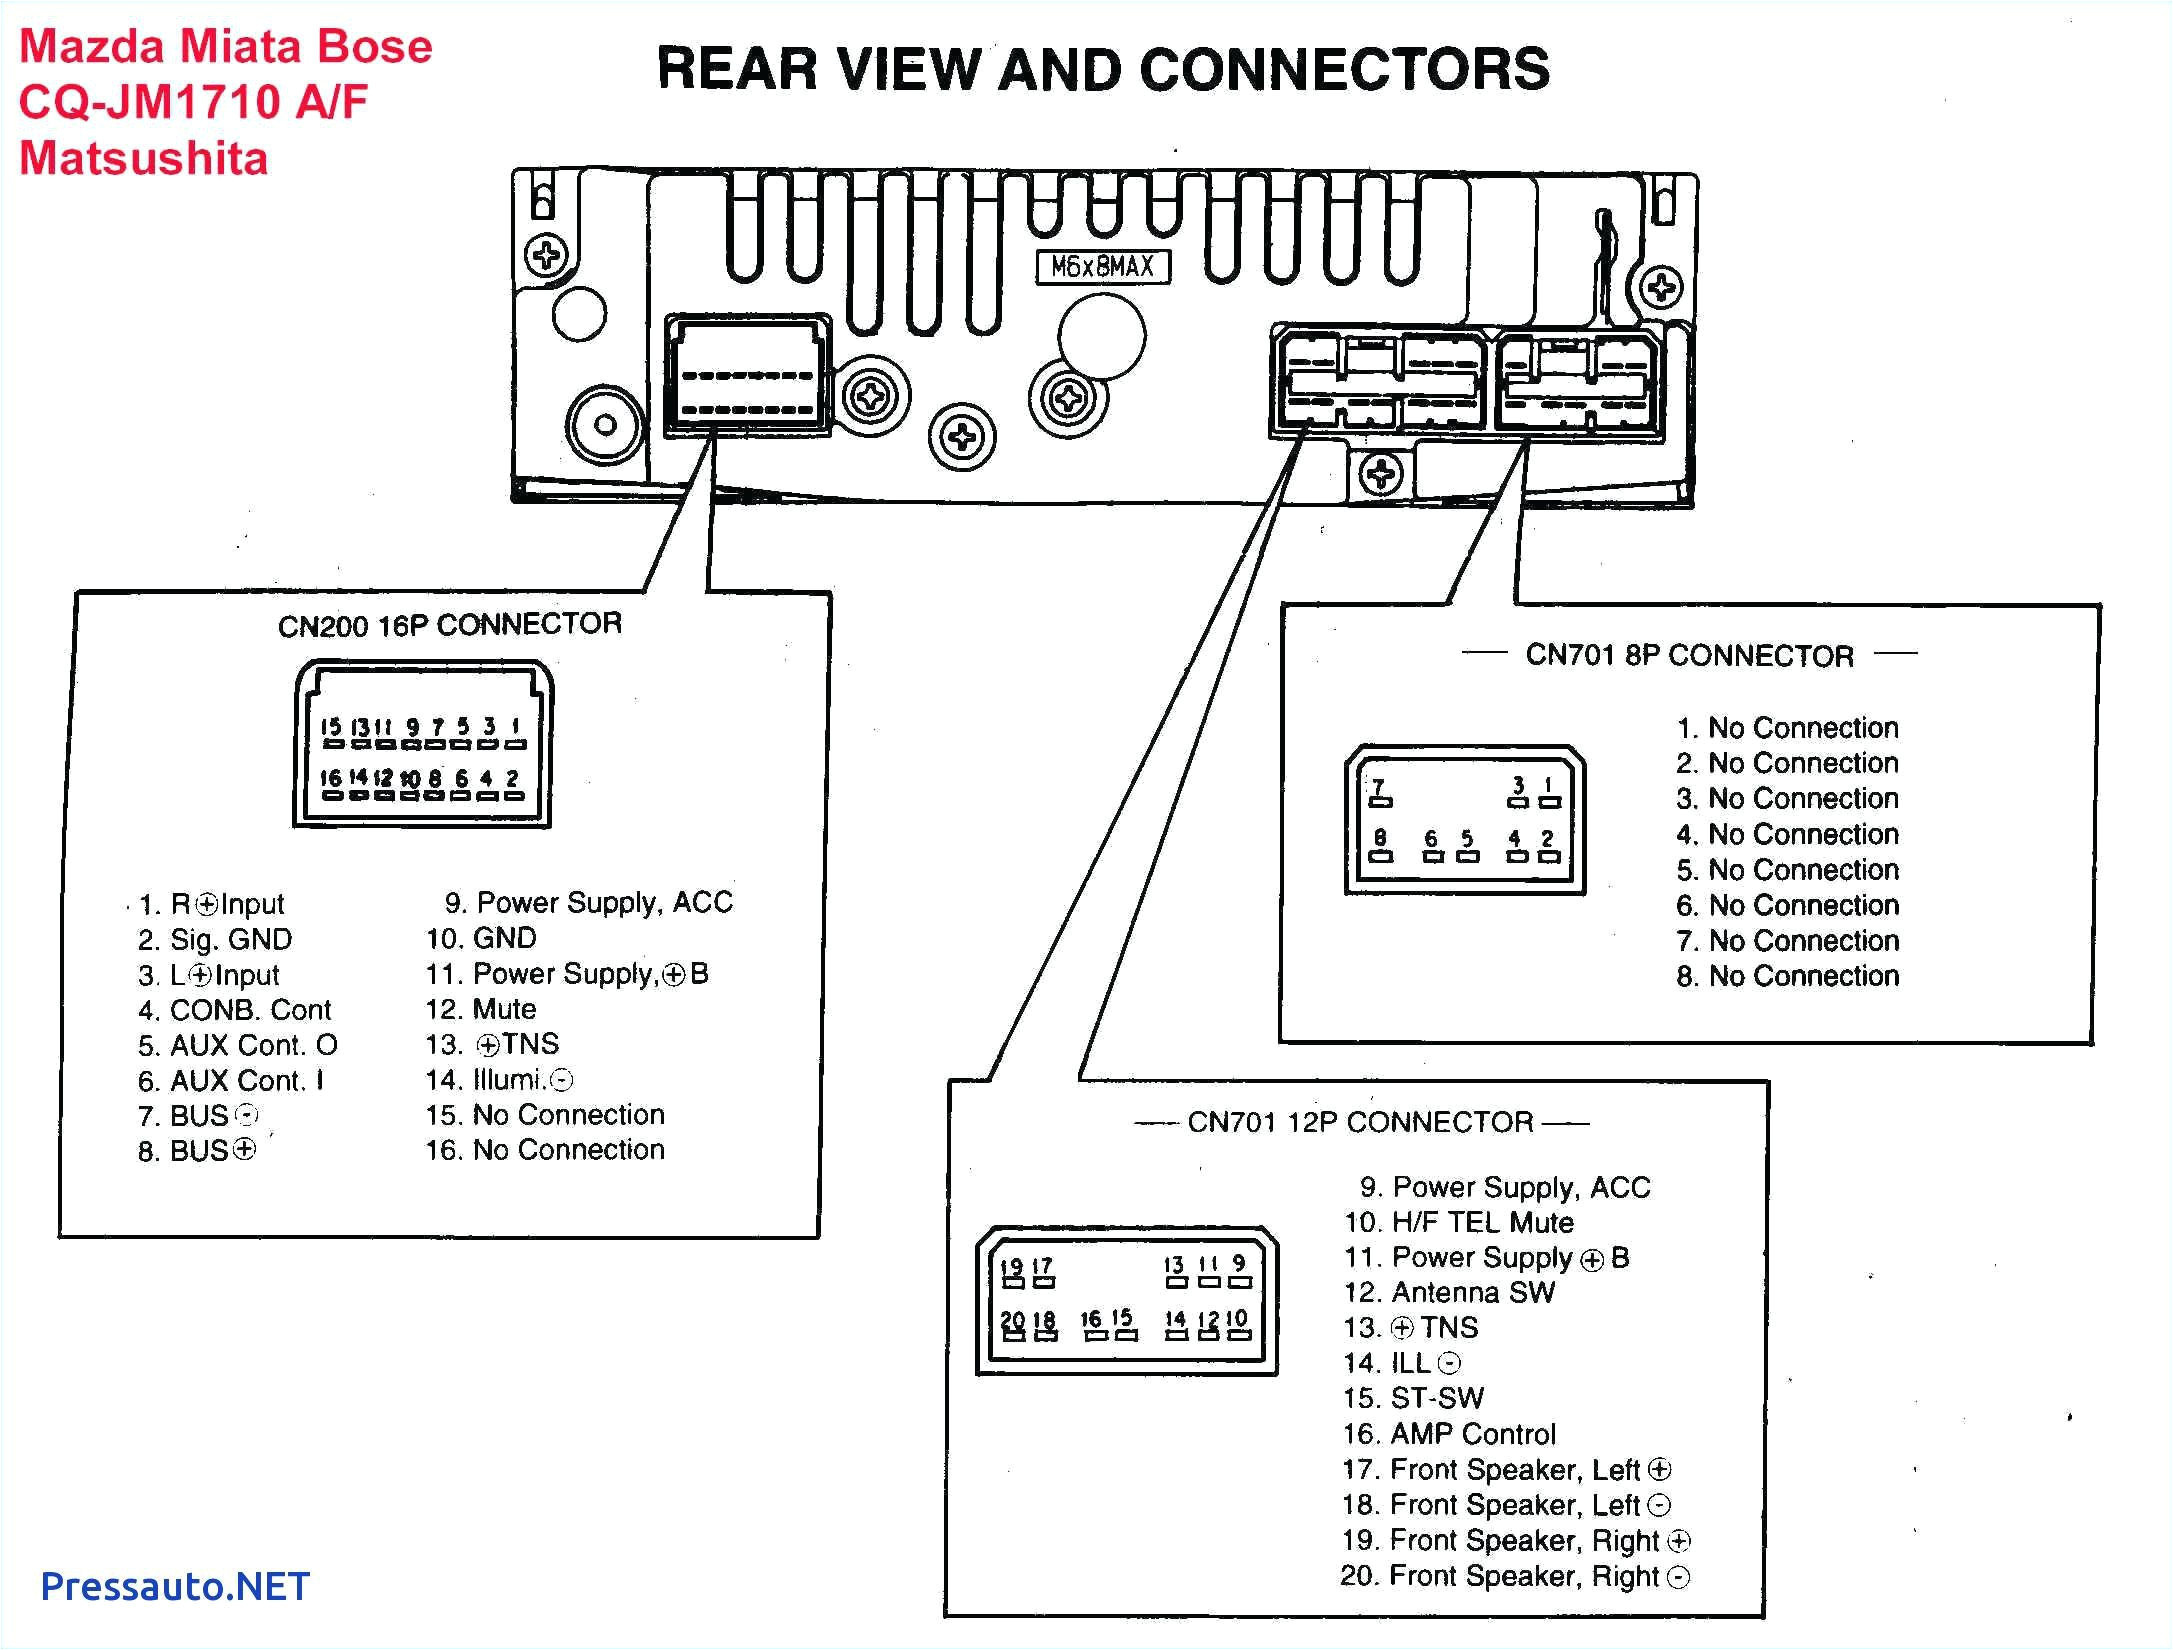 mazda millenia ignition wiring diagram wiring diagrams terms injector wiring diagram 2000 mazda millenia